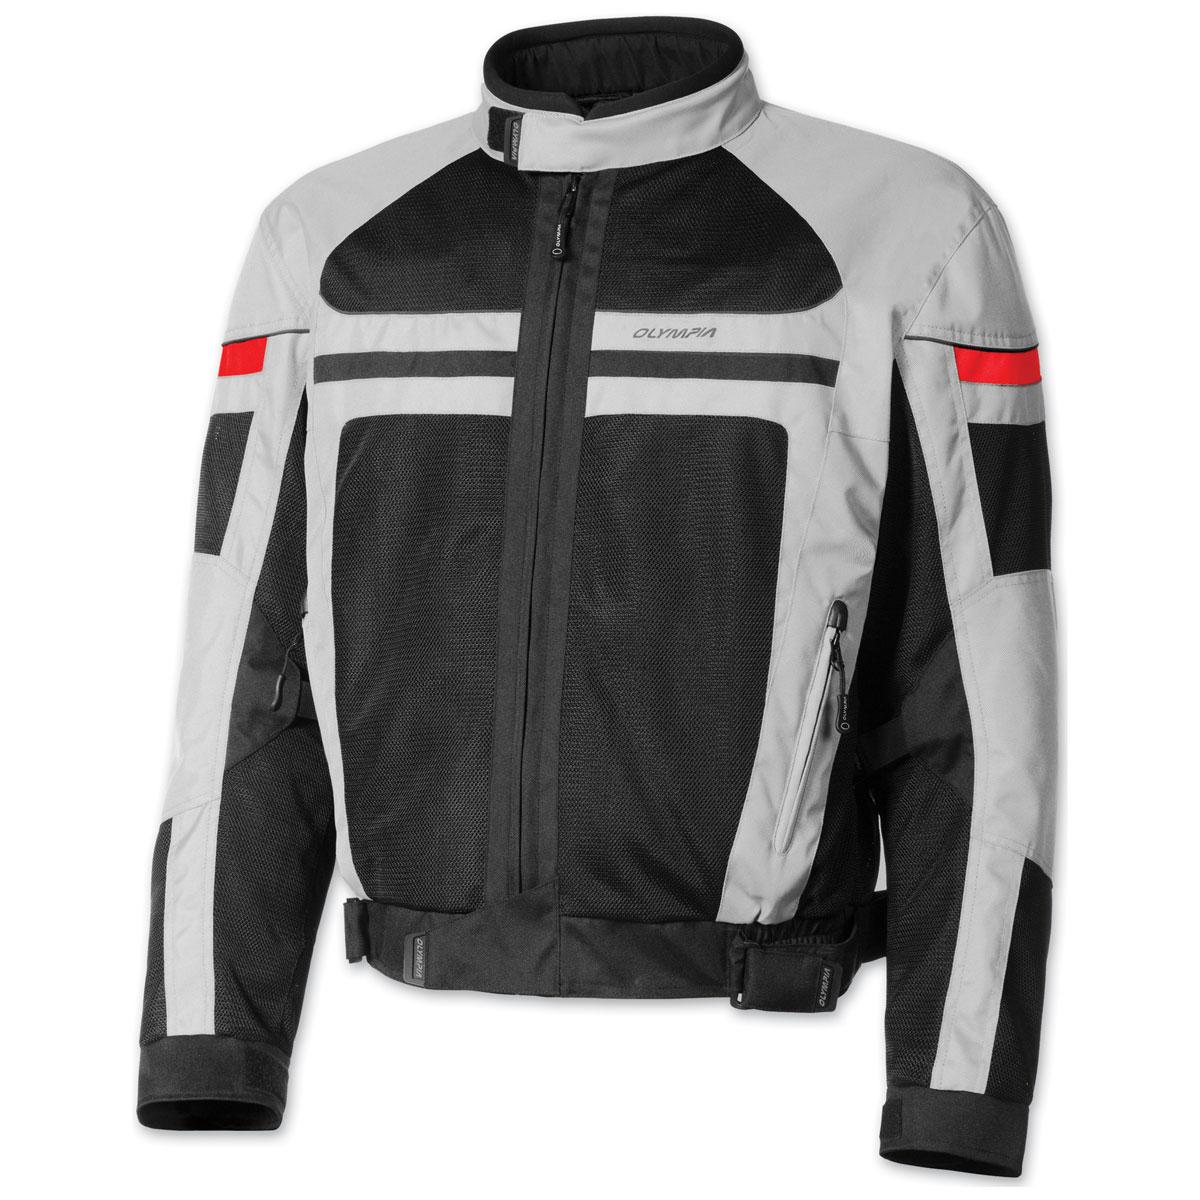 Olympia Moto Sports Men's Newport Silver Jacket